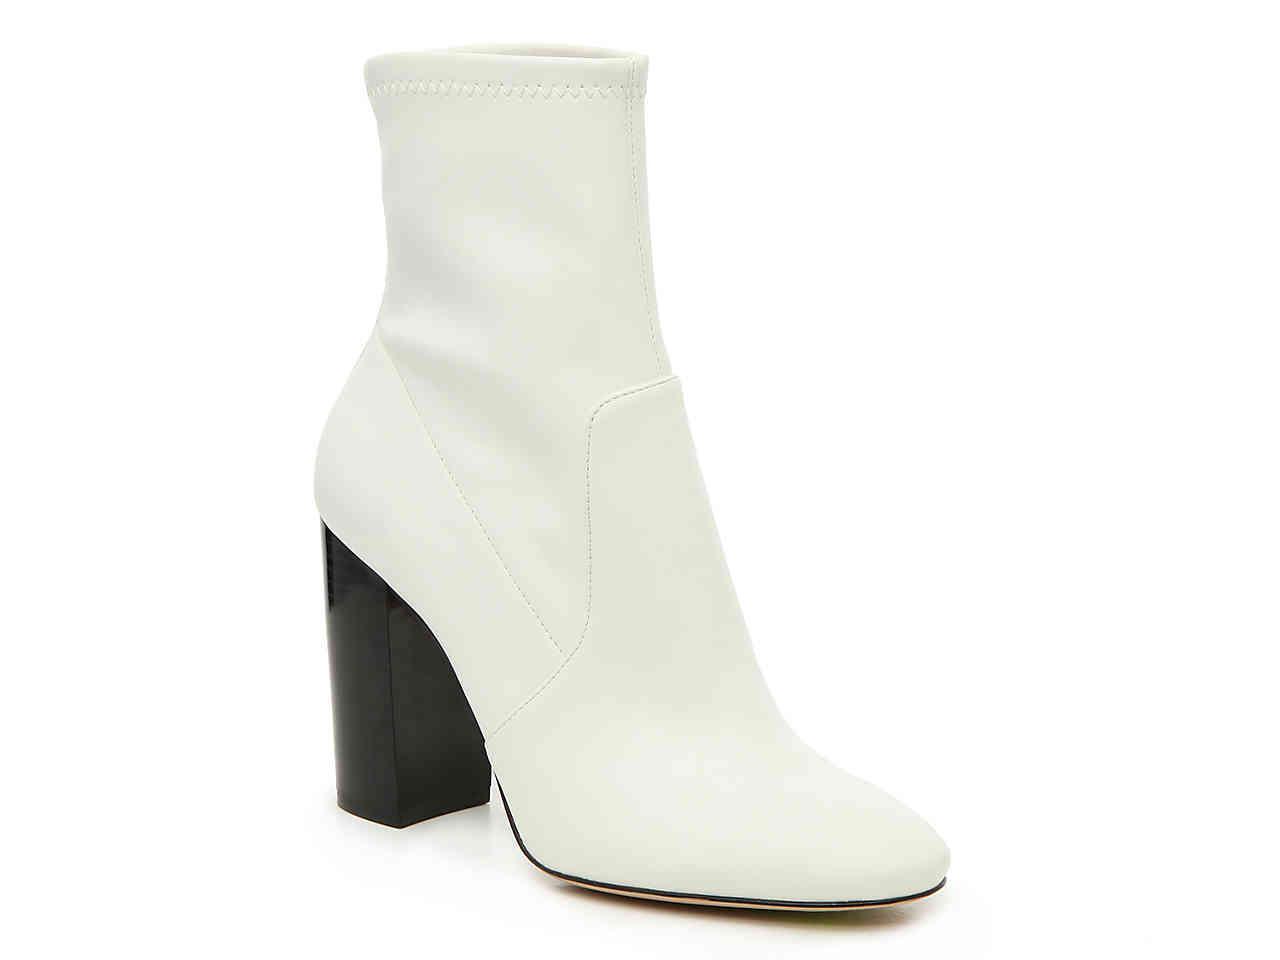 ALDO Synthetic Lovelee Bootie in White